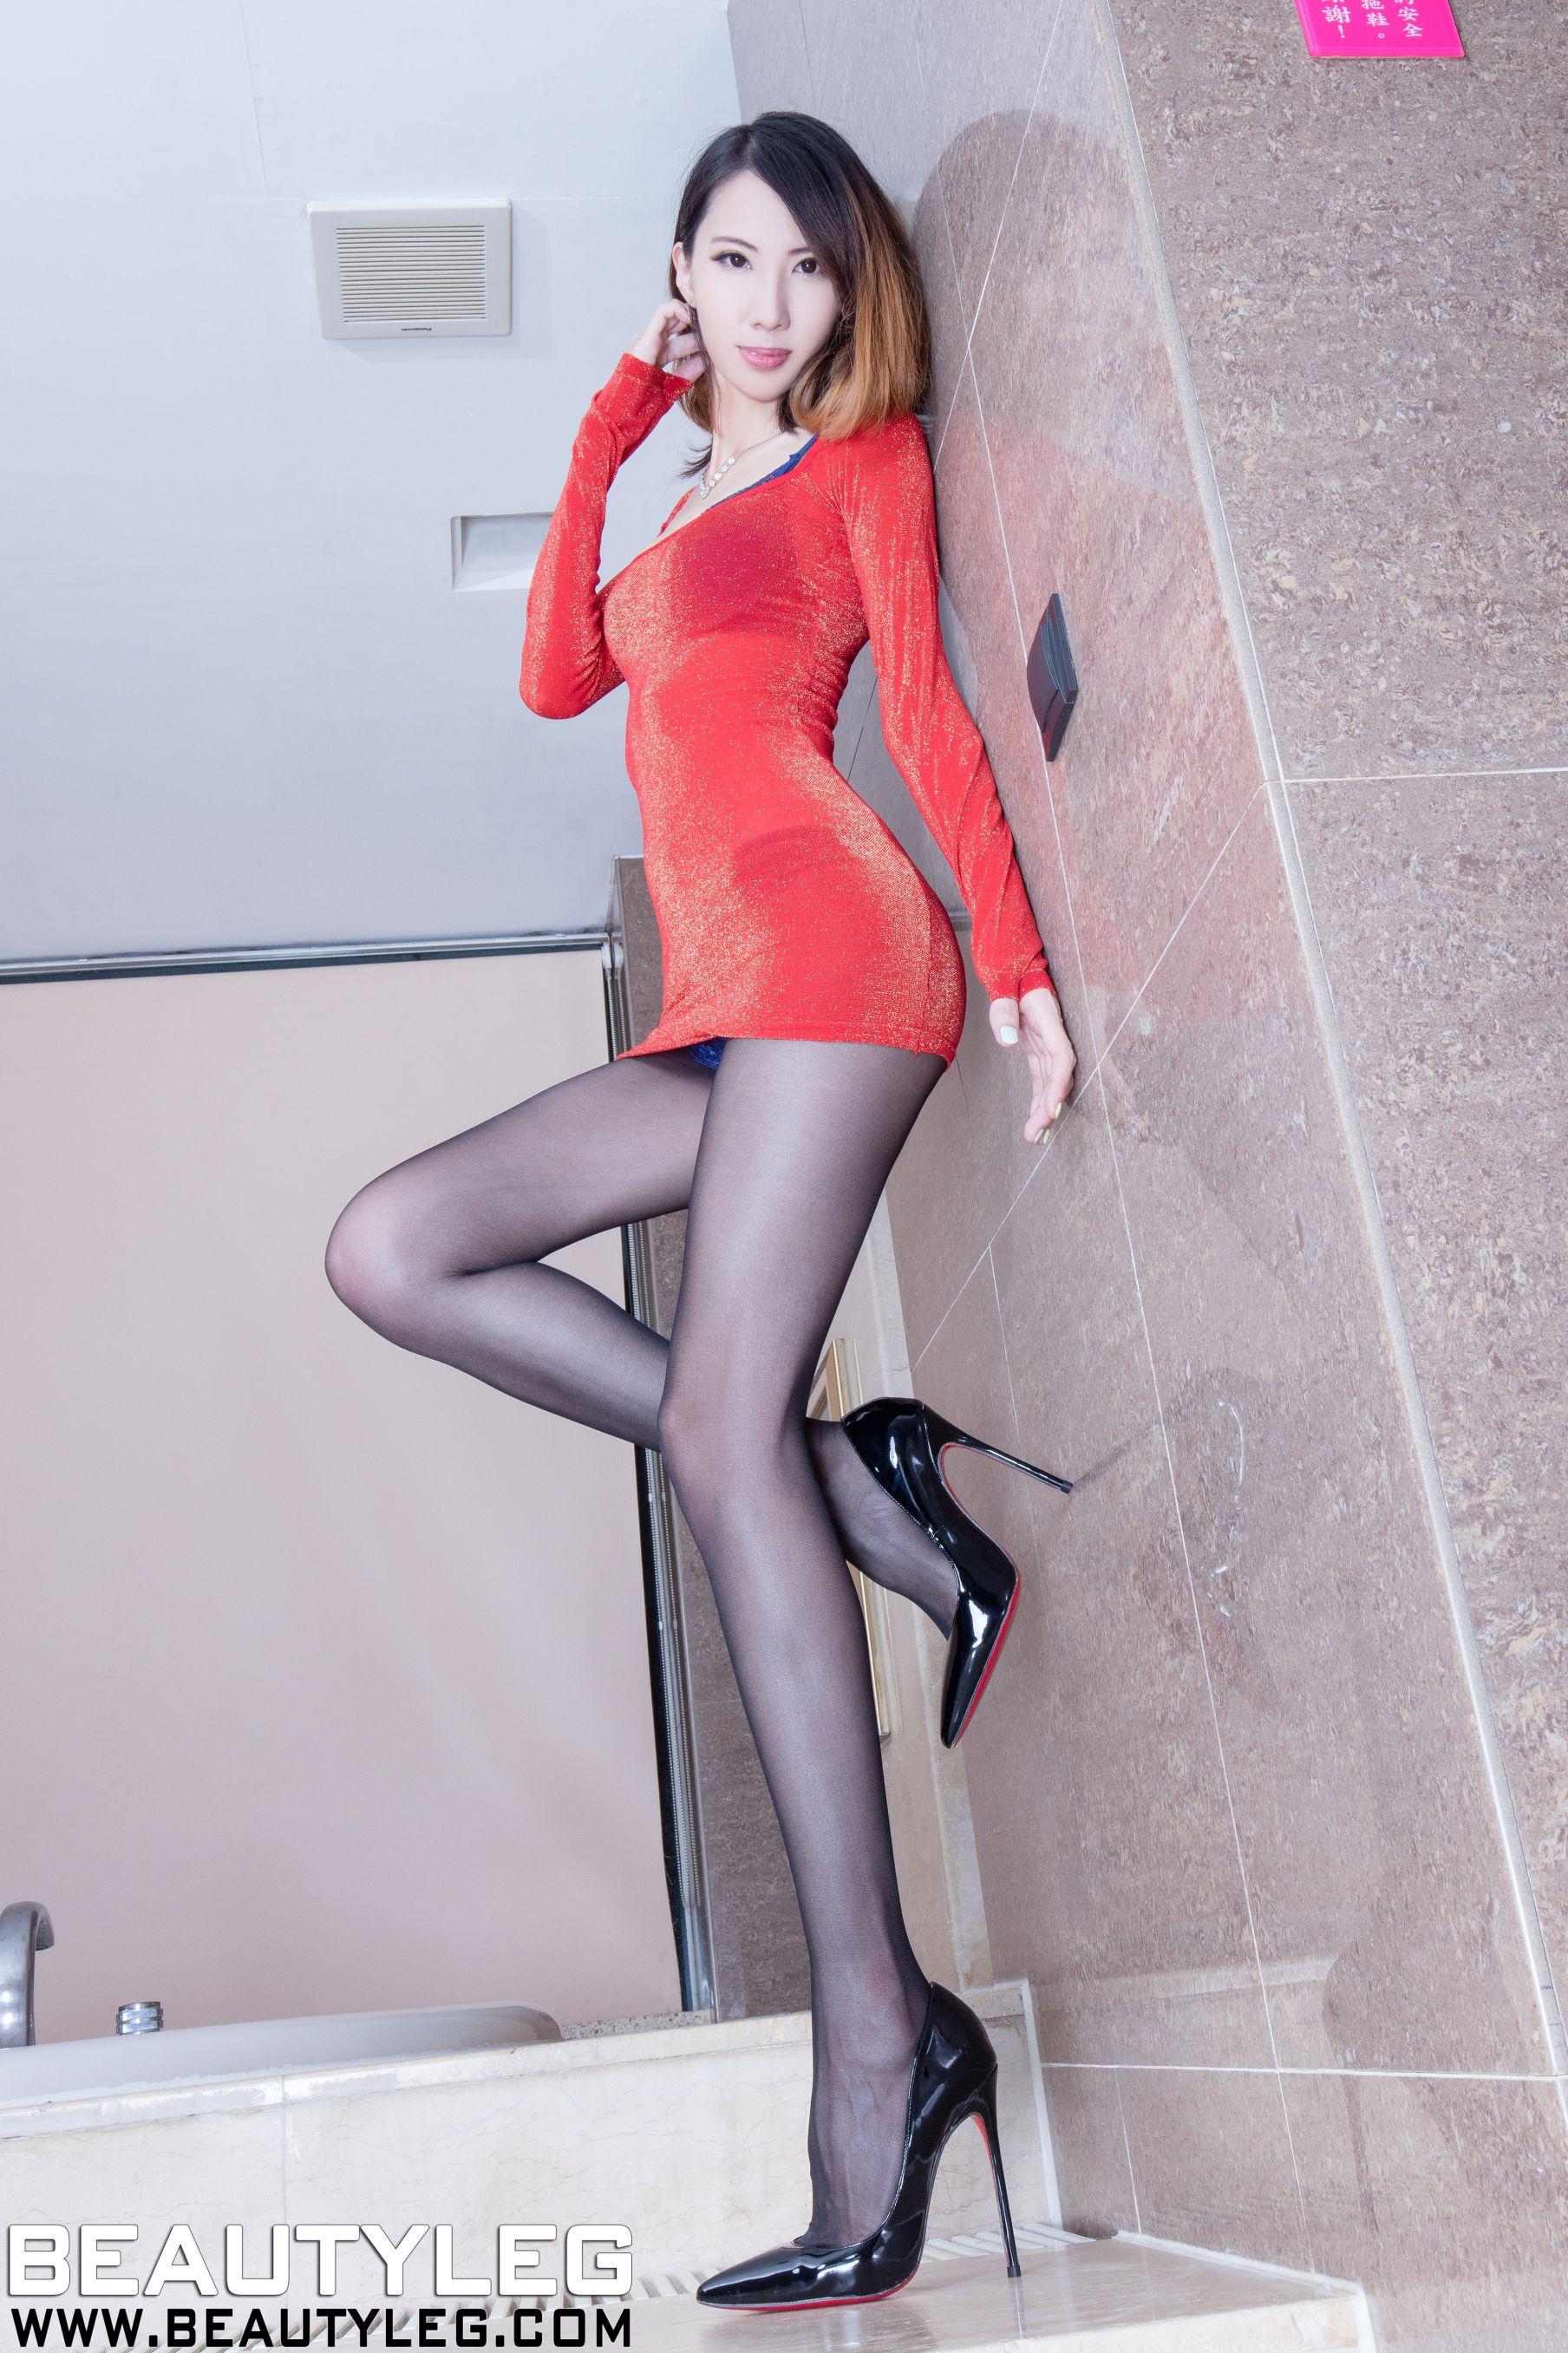 VOL.1062 [Beautyleg]丝袜美腿腿模长腿美女丝袜女郎:童采萱(Beautyleg Yoyo,腿模Yoyo)高品质写真套图(43P)